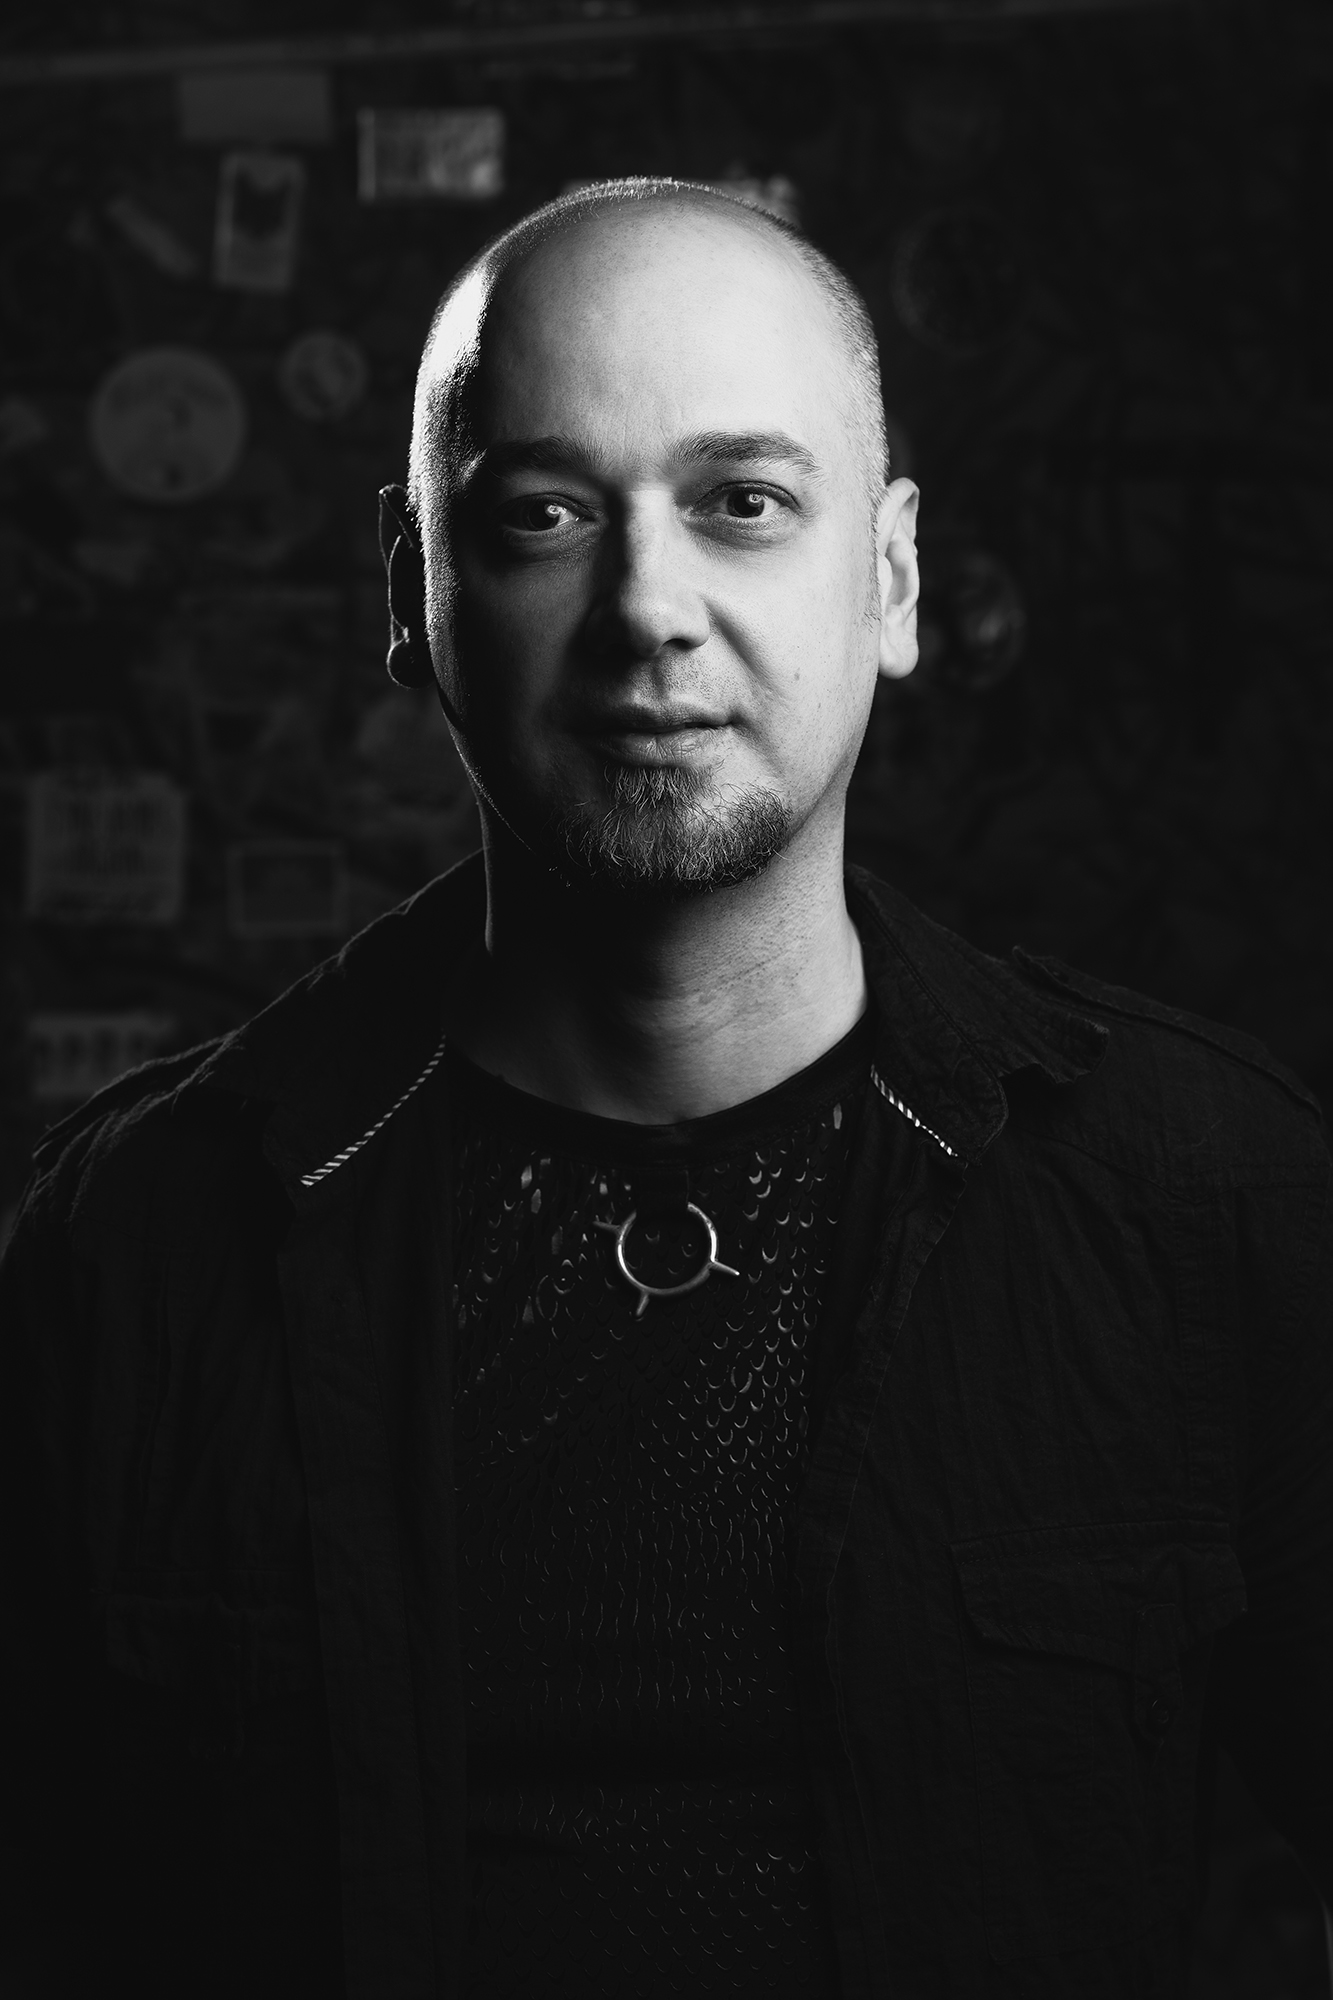 David Johnson - DrumsDeath Of Art